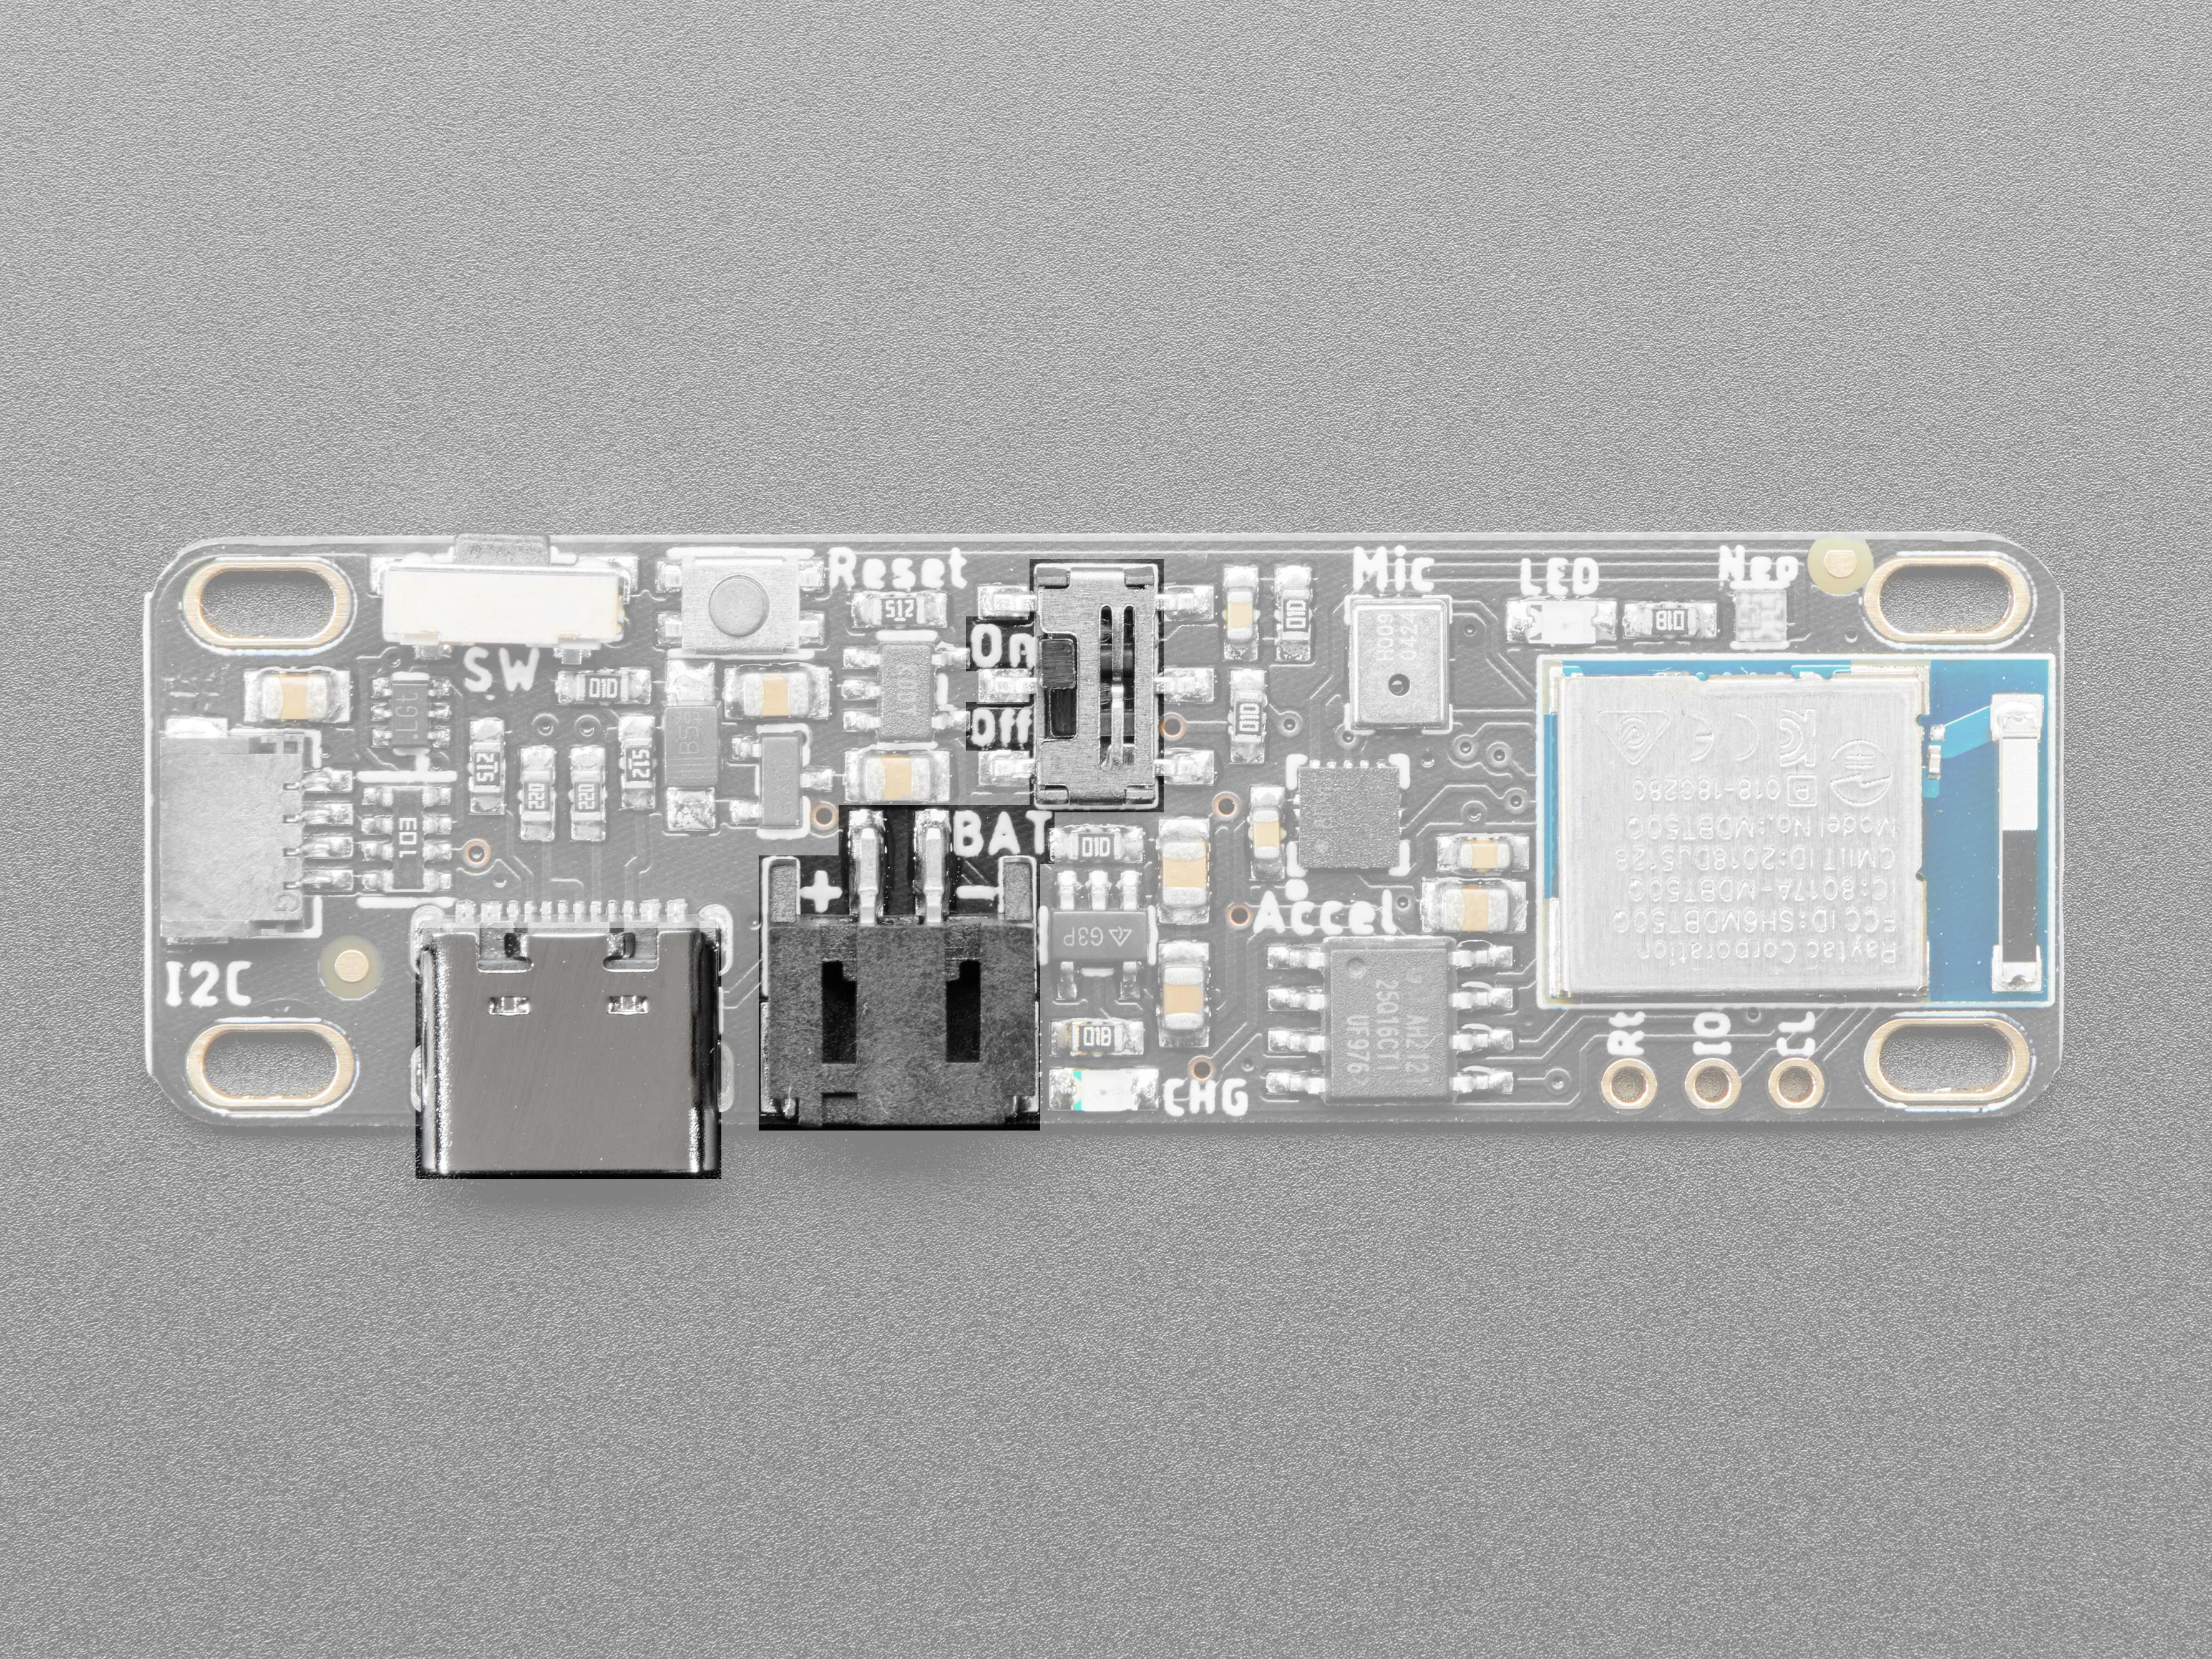 adafruit_products_EyeLightsD_USB_battery_on_off.jpg